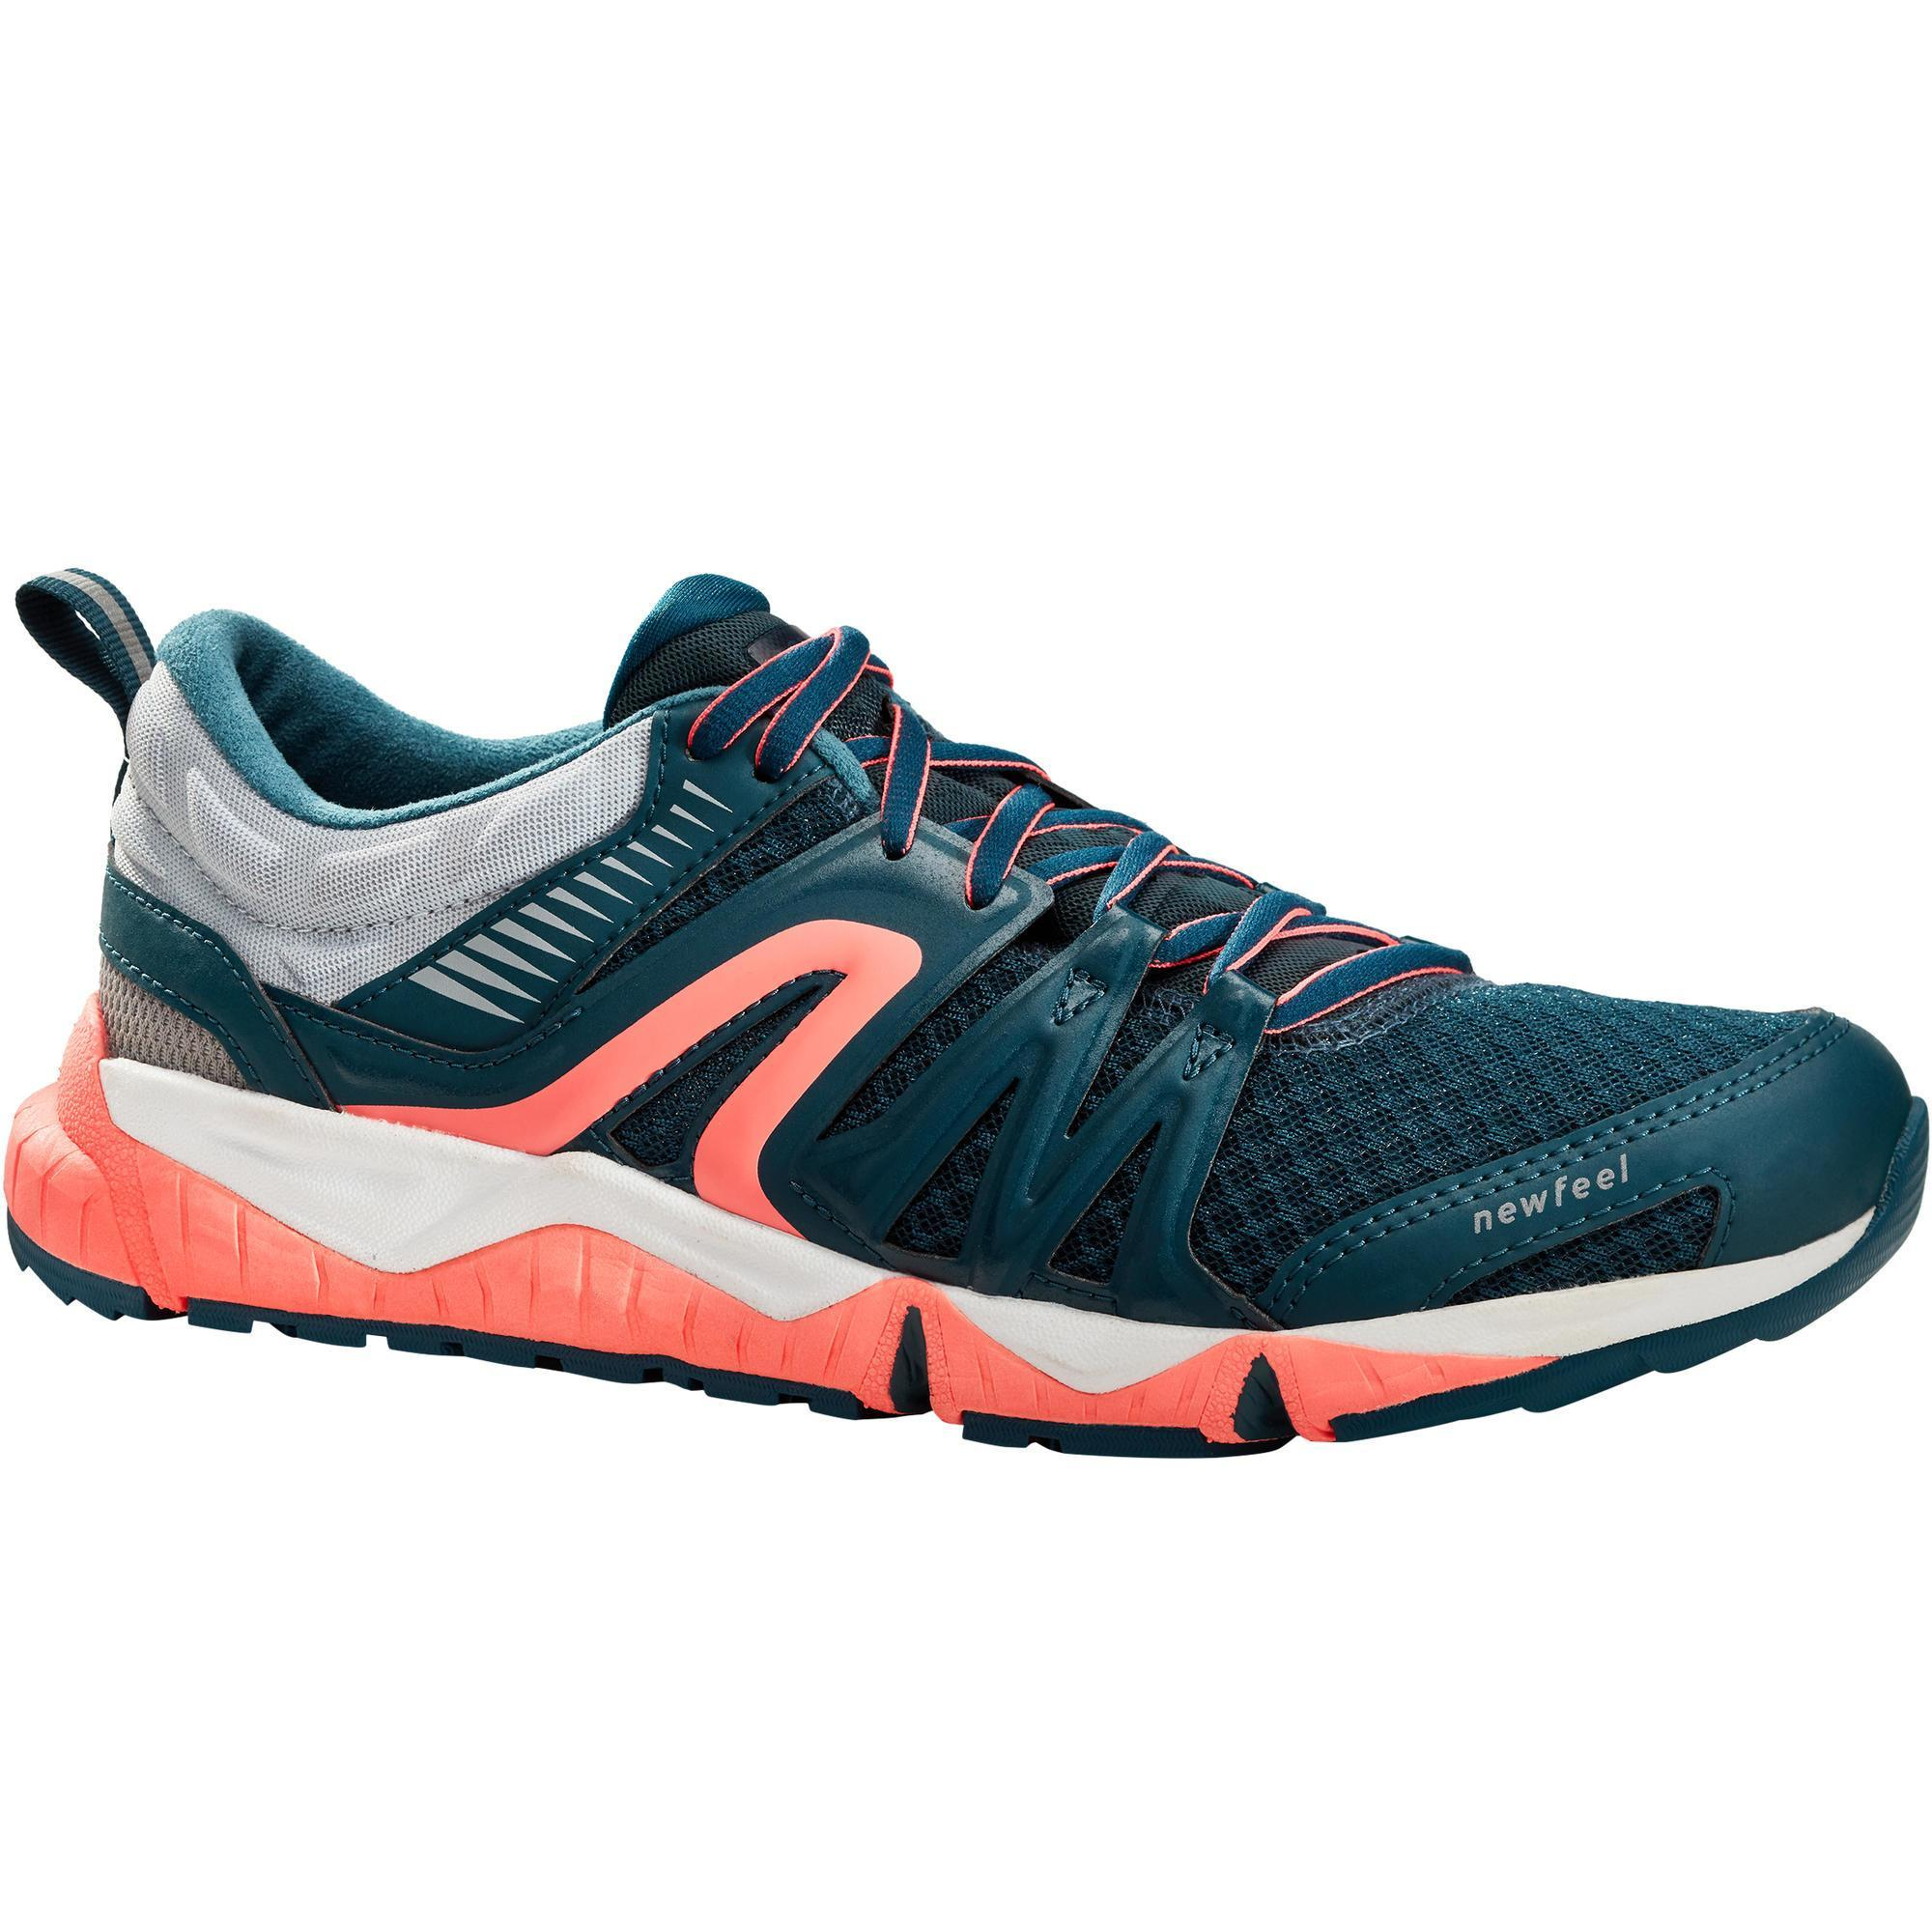 Walkingschuhe PW 900 Propulse Motion Damen graublau | Schuhe > Sportschuhe > Walkingschuhe | Newfeel